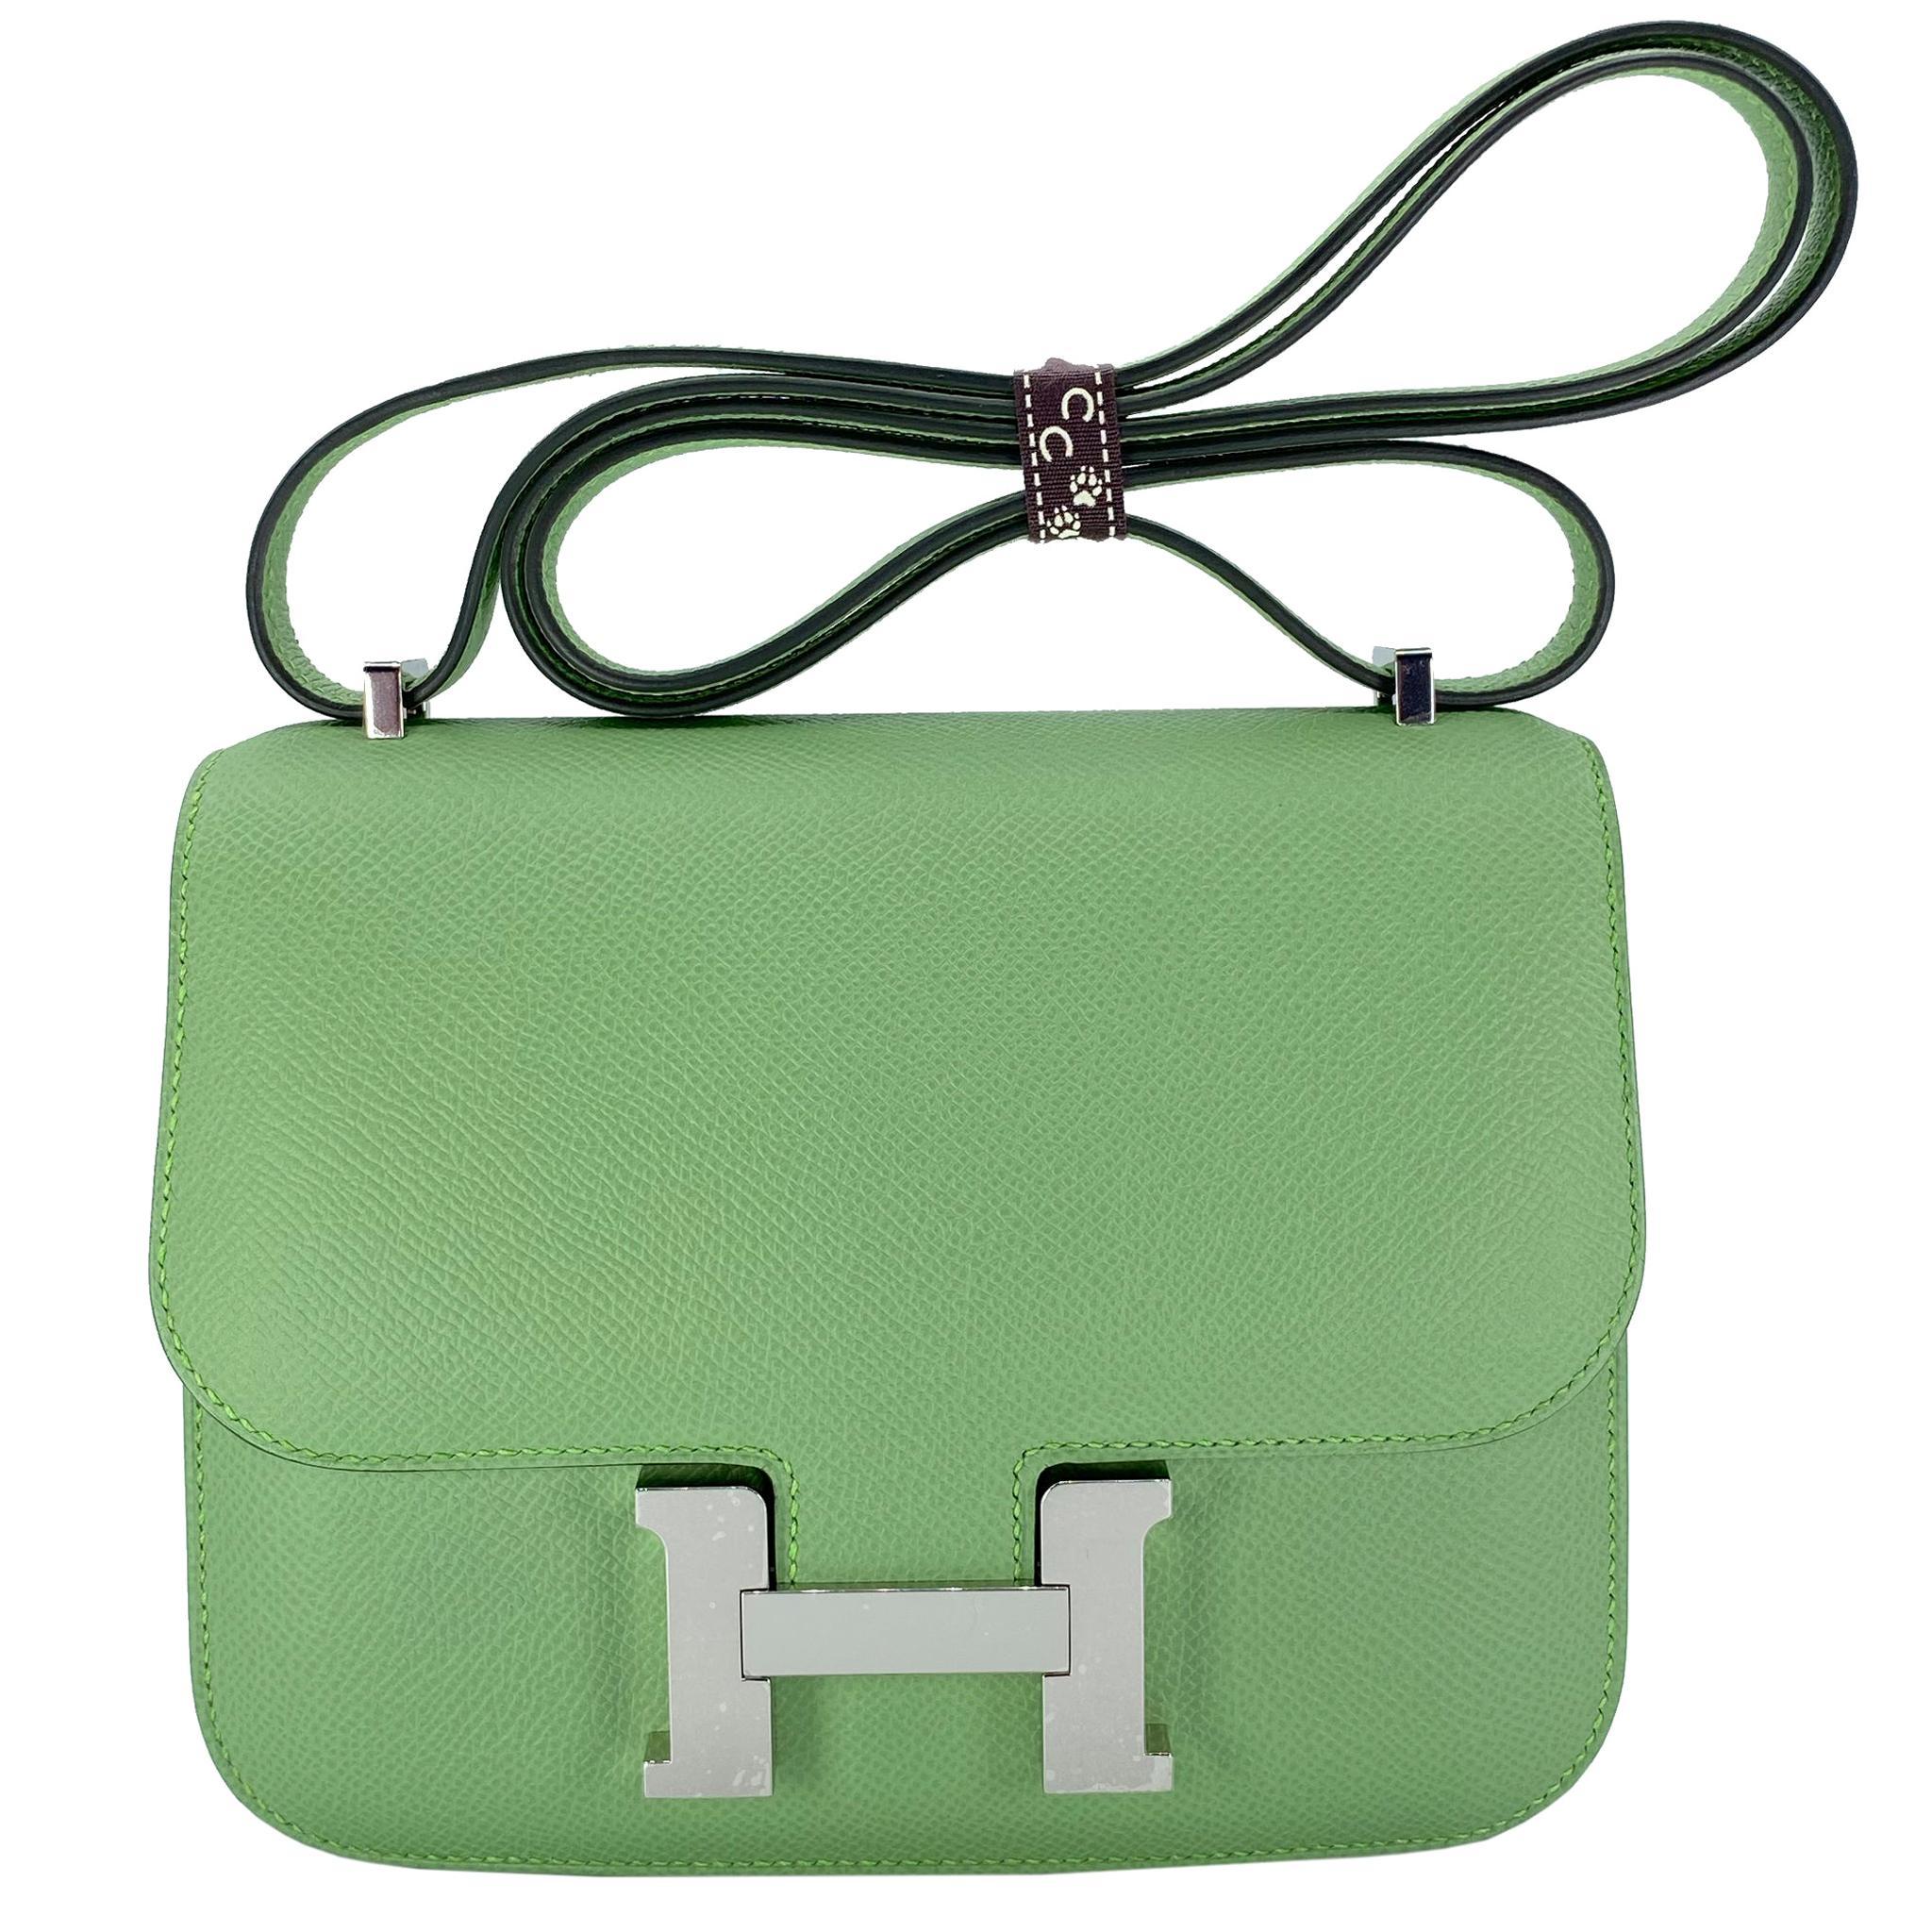 Hermès Constance 18cm Vert Criquet Epsom Leather Palladium Hardware